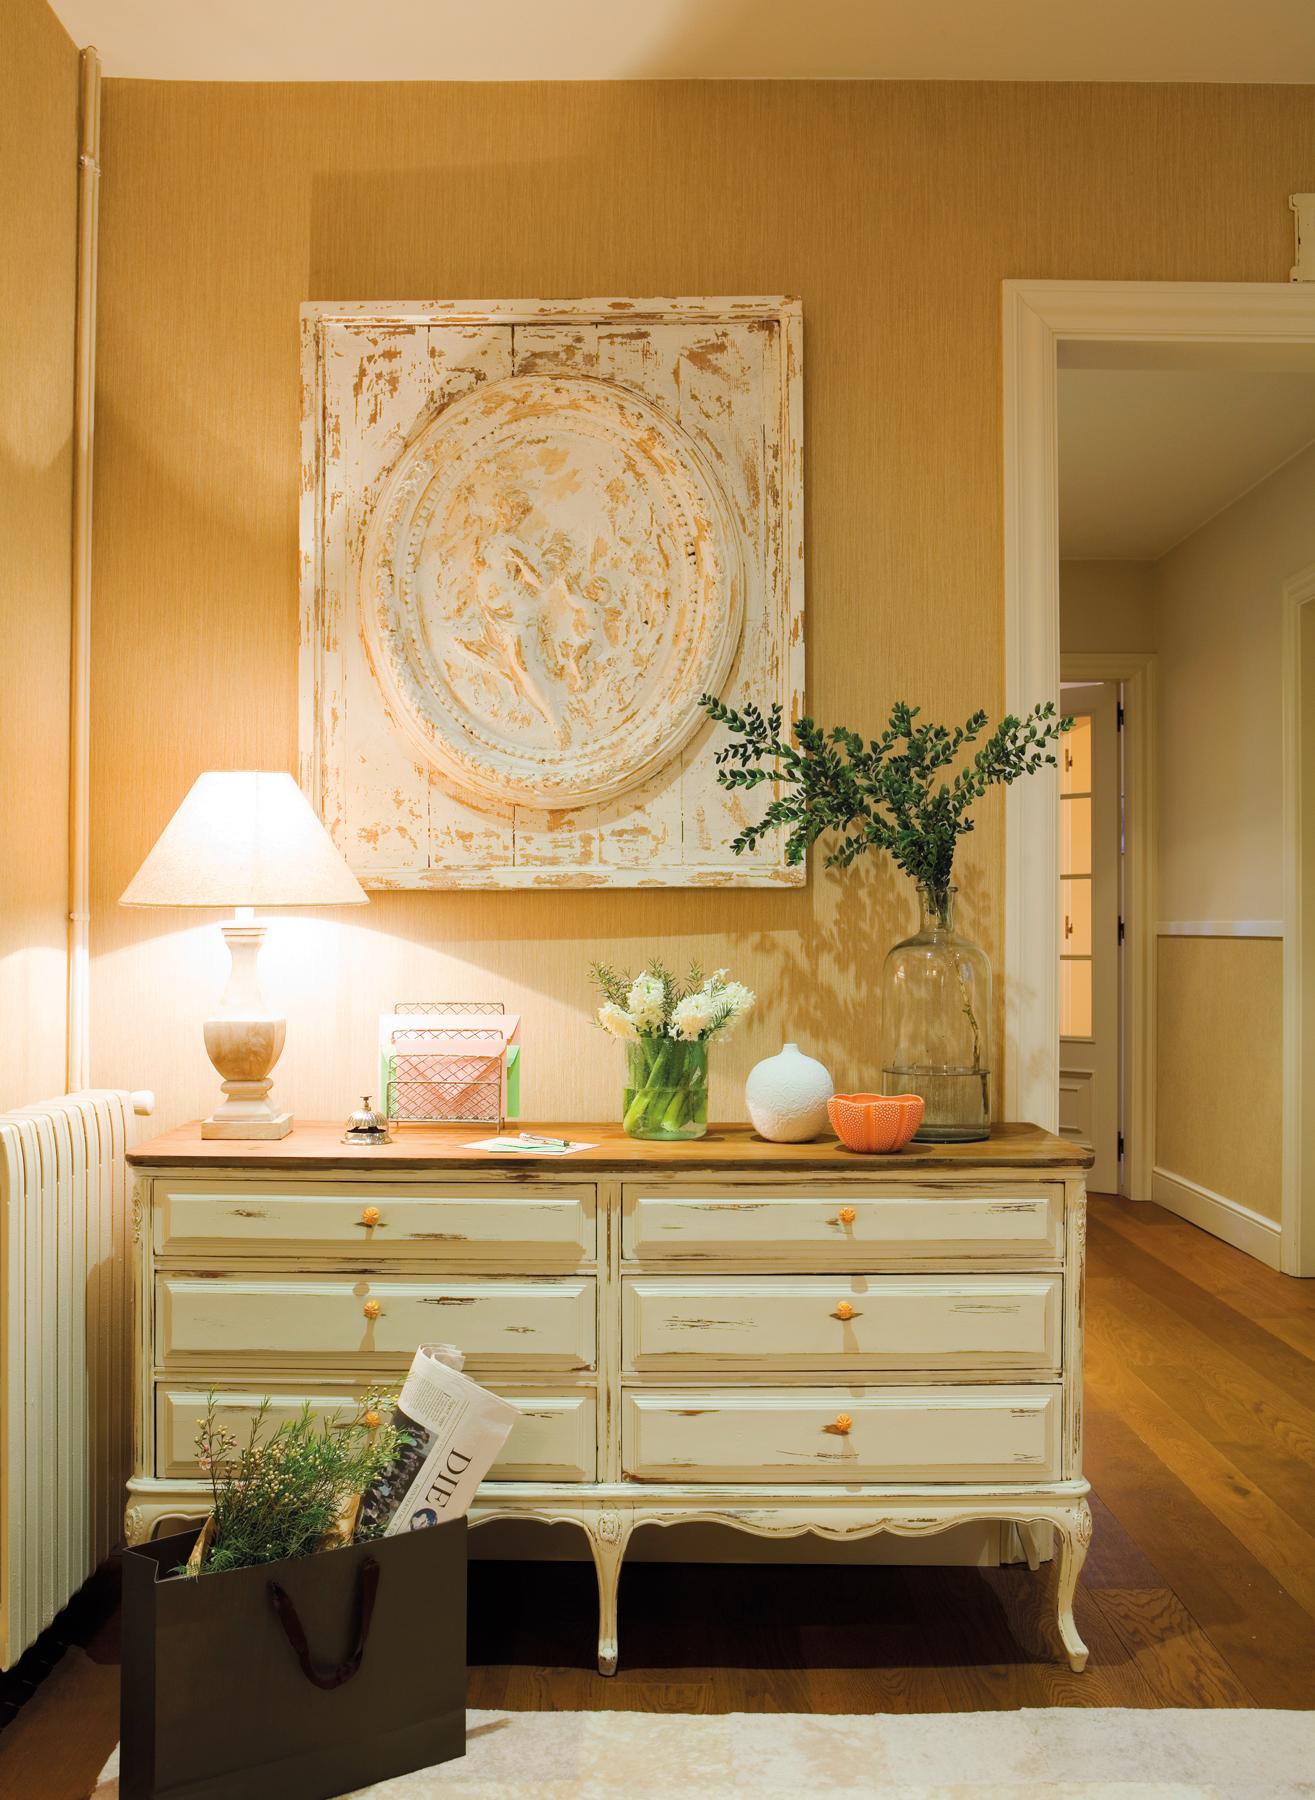 Diez ideas de decoraci n para preparar tu recibidor para - Comoda para recibidor ...